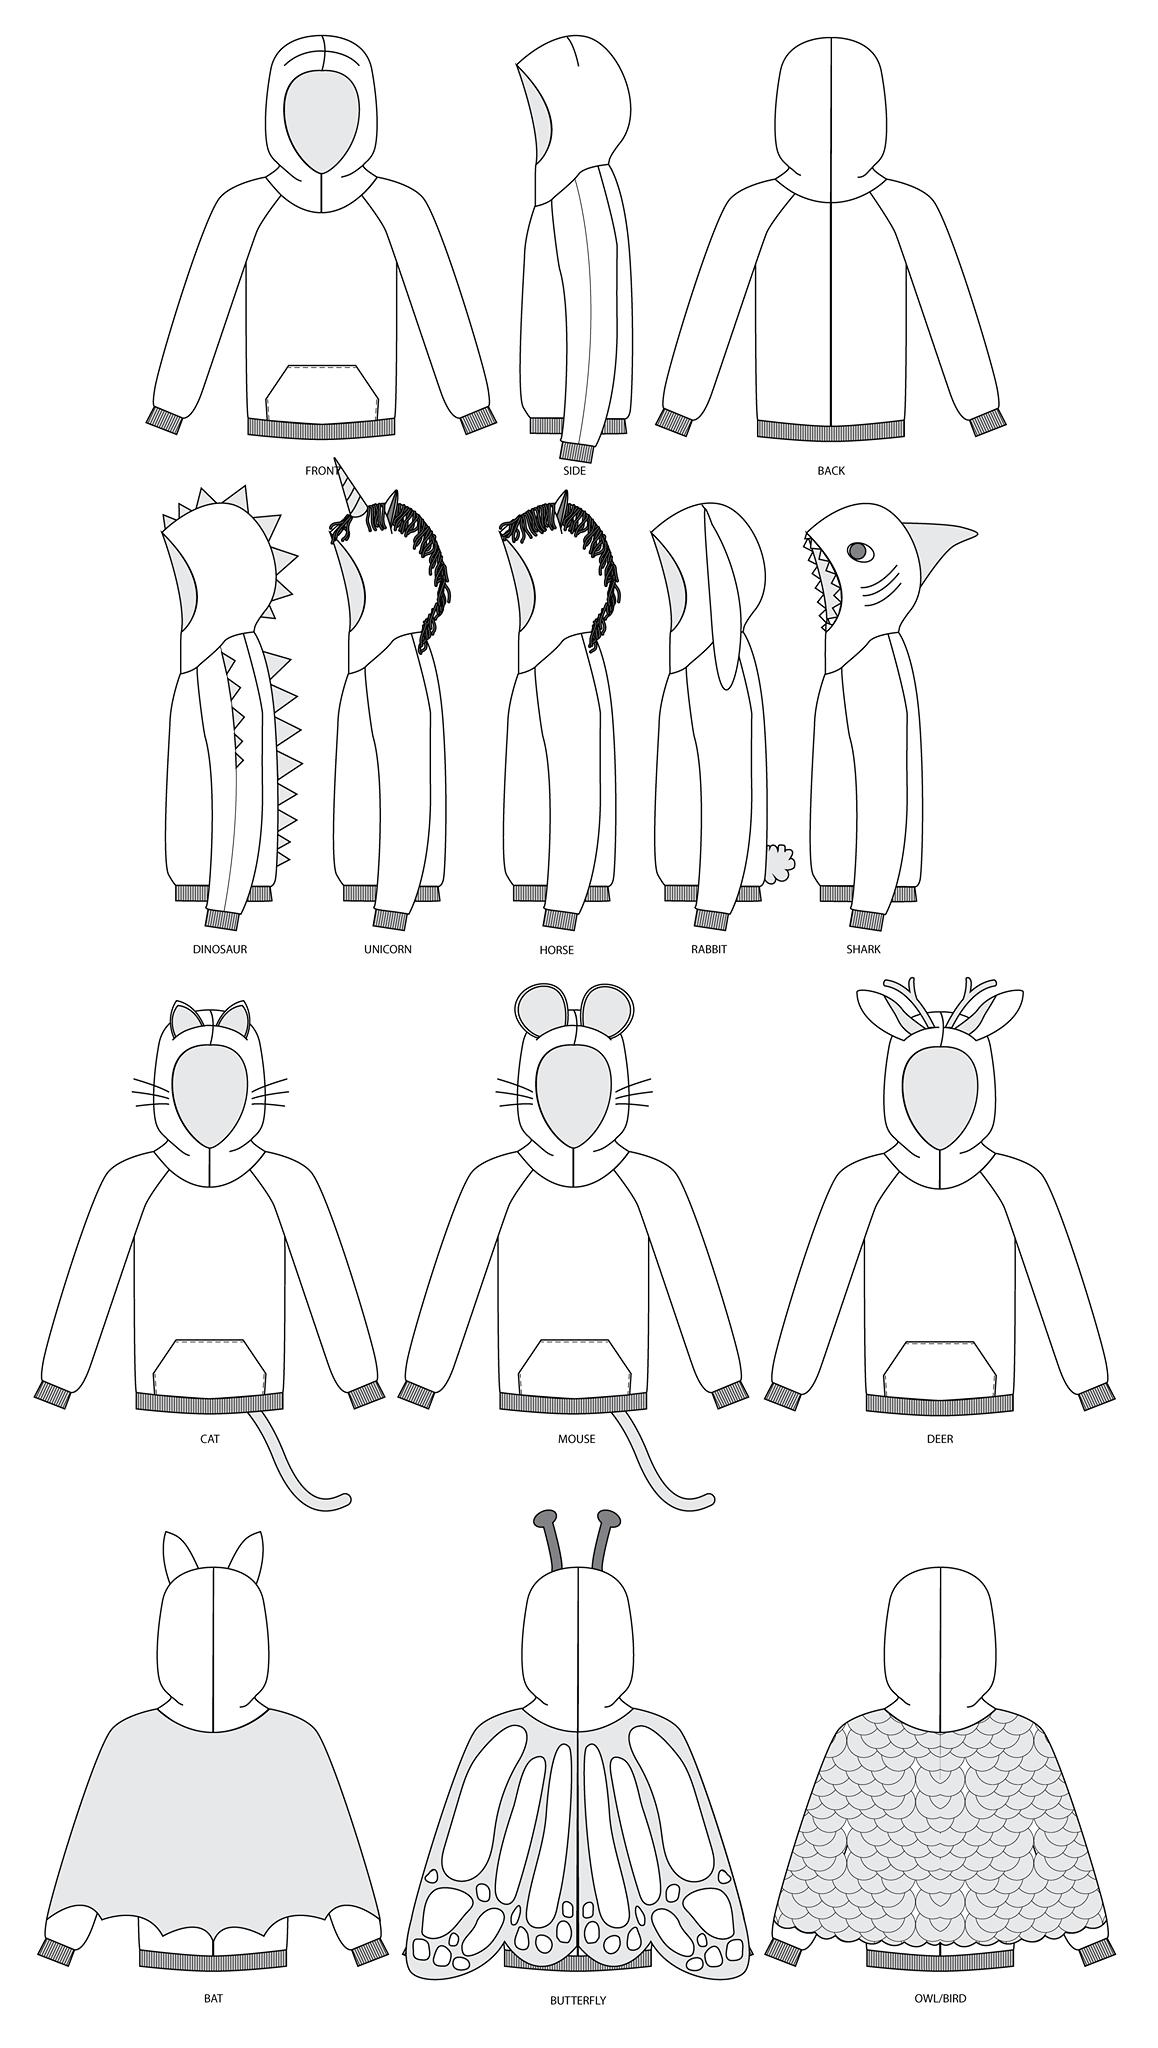 pdf drawings to sketch up